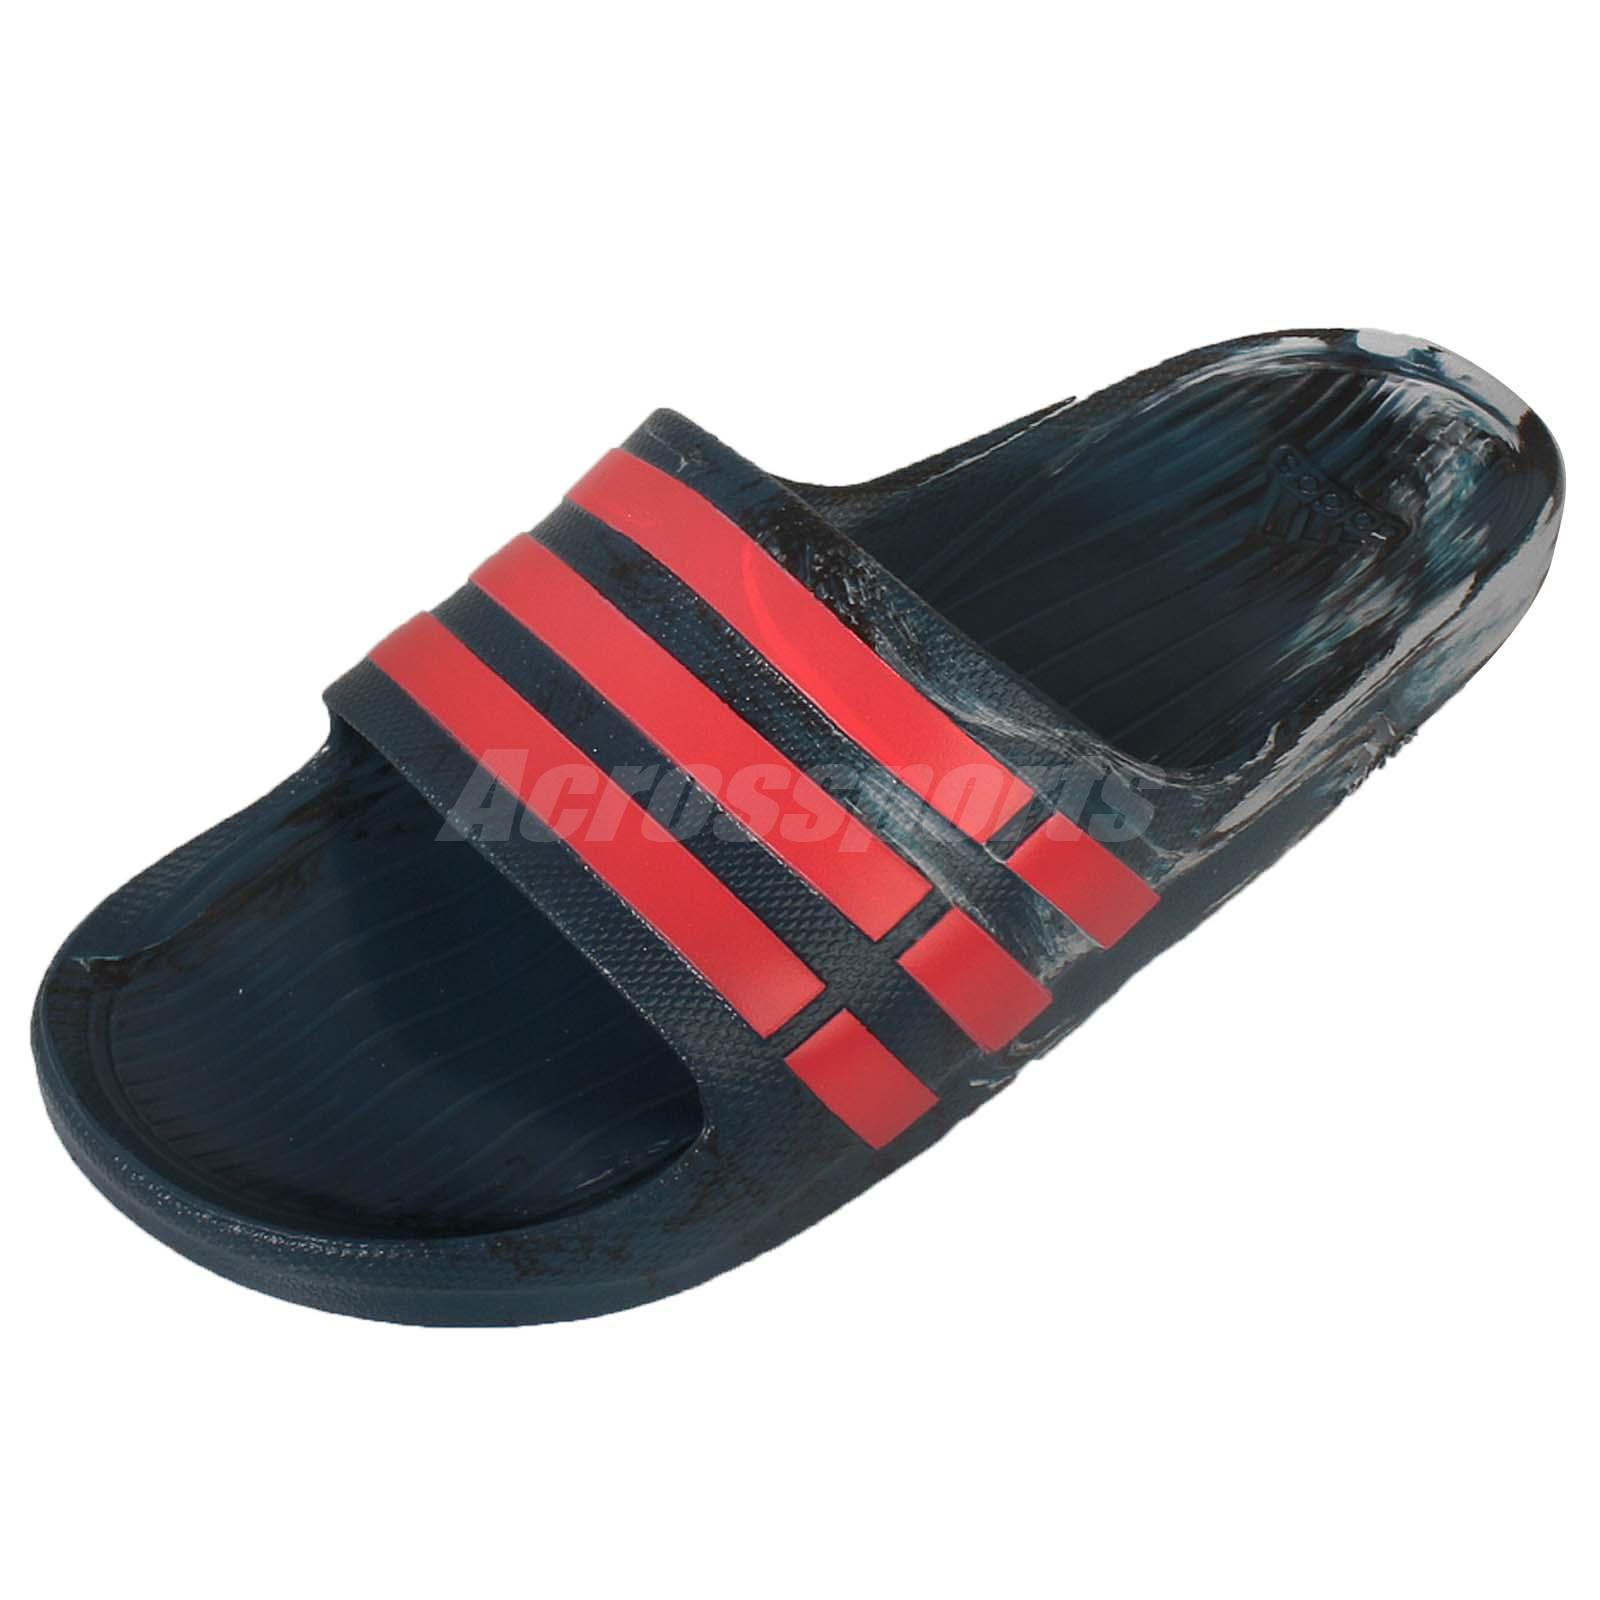 Adidas Neo Court Adapt